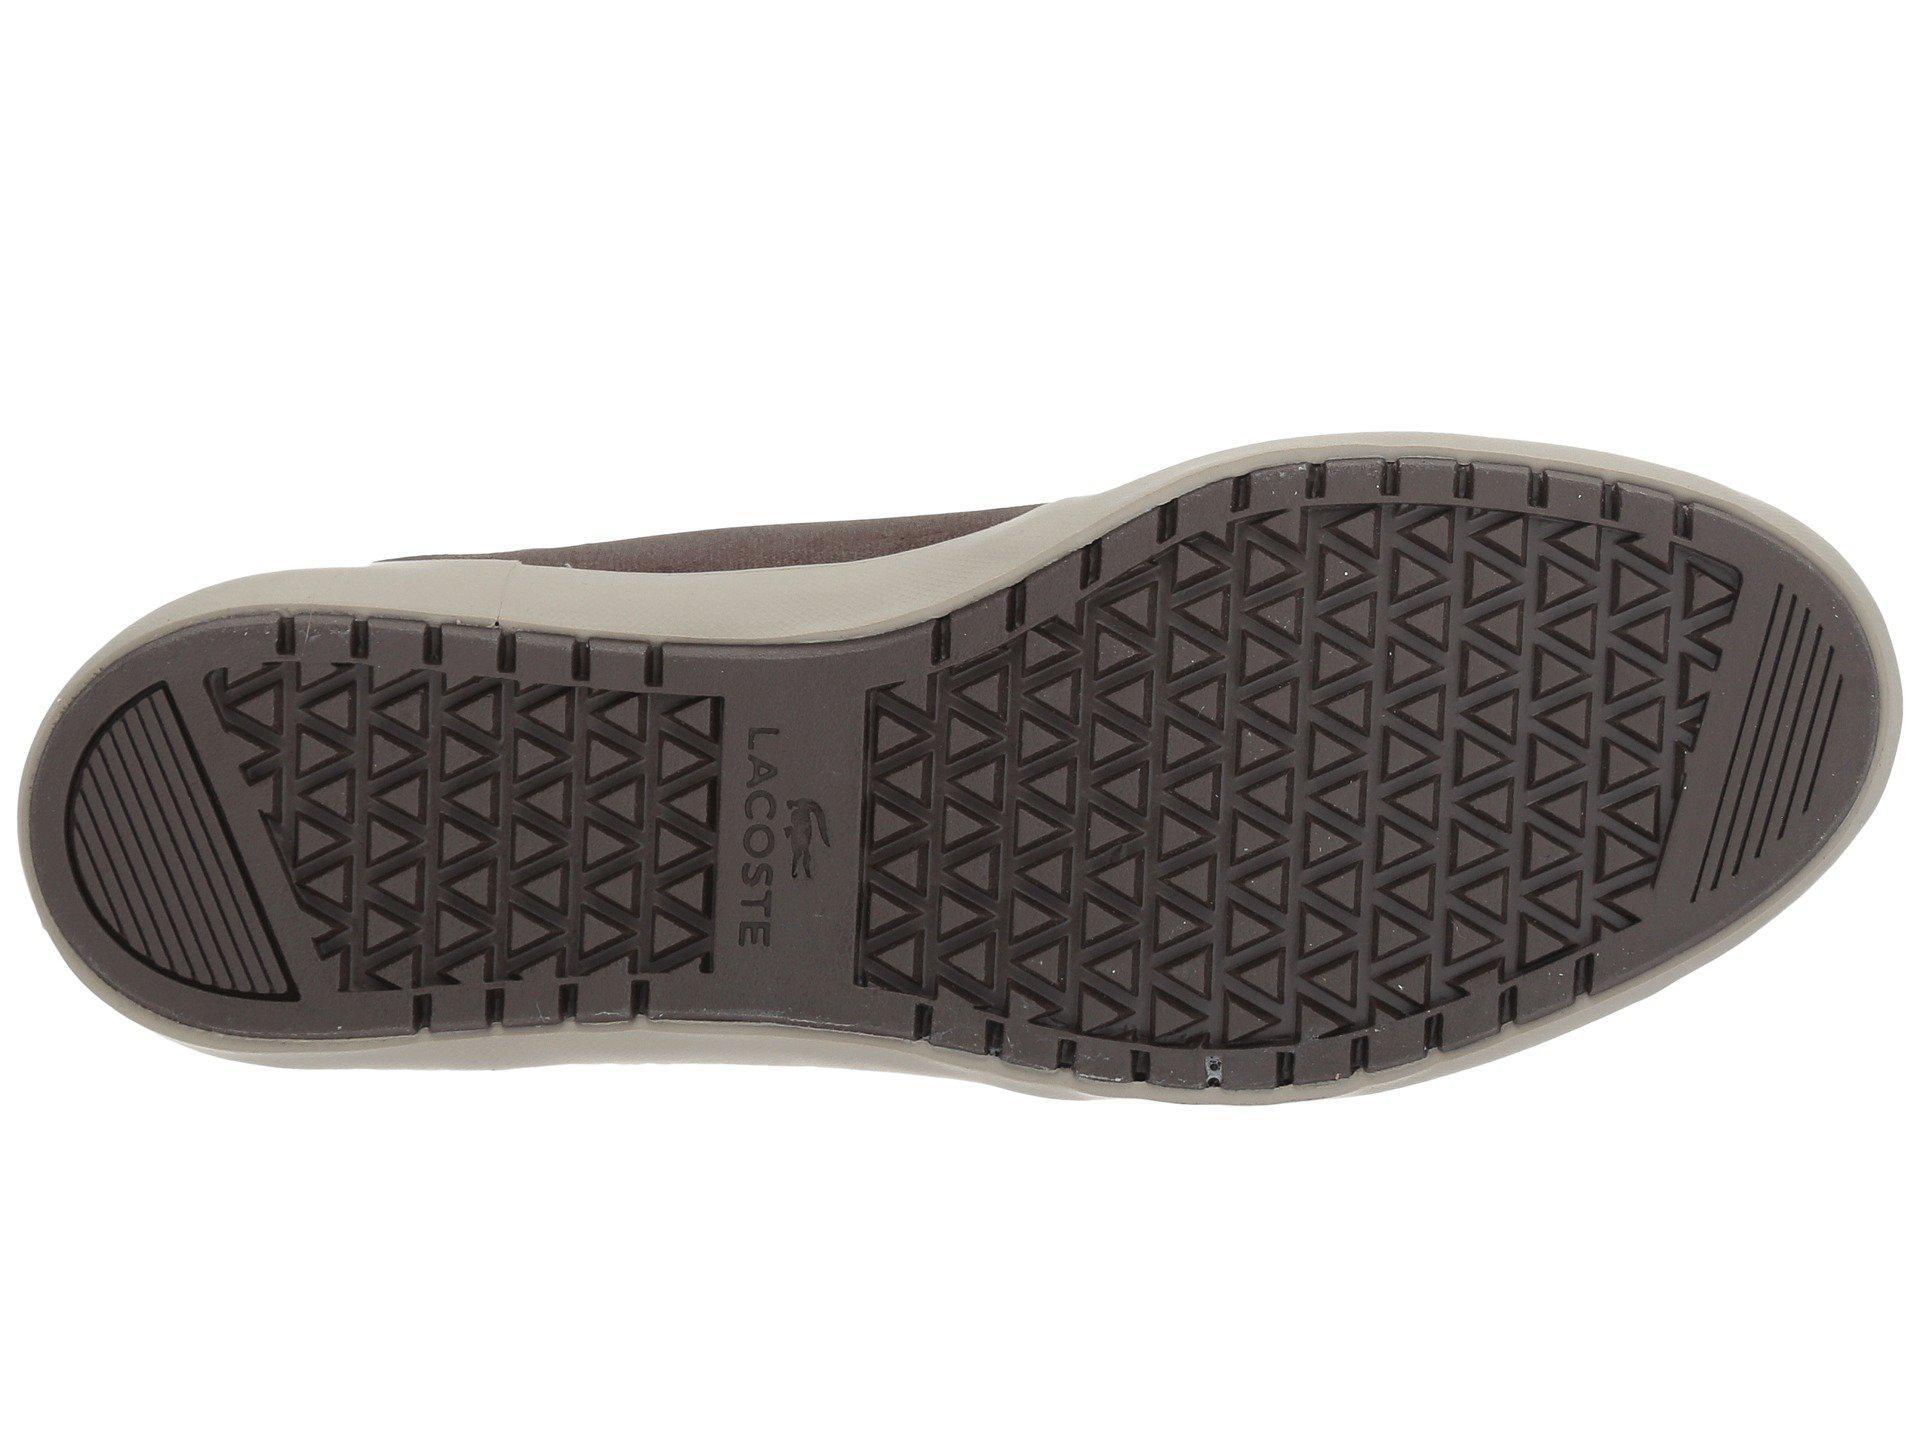 fdb4d8e4b822a Lyst - Lacoste Ampthill Terra 417 1 Cam (dark Brown) Men s Shoes in ...